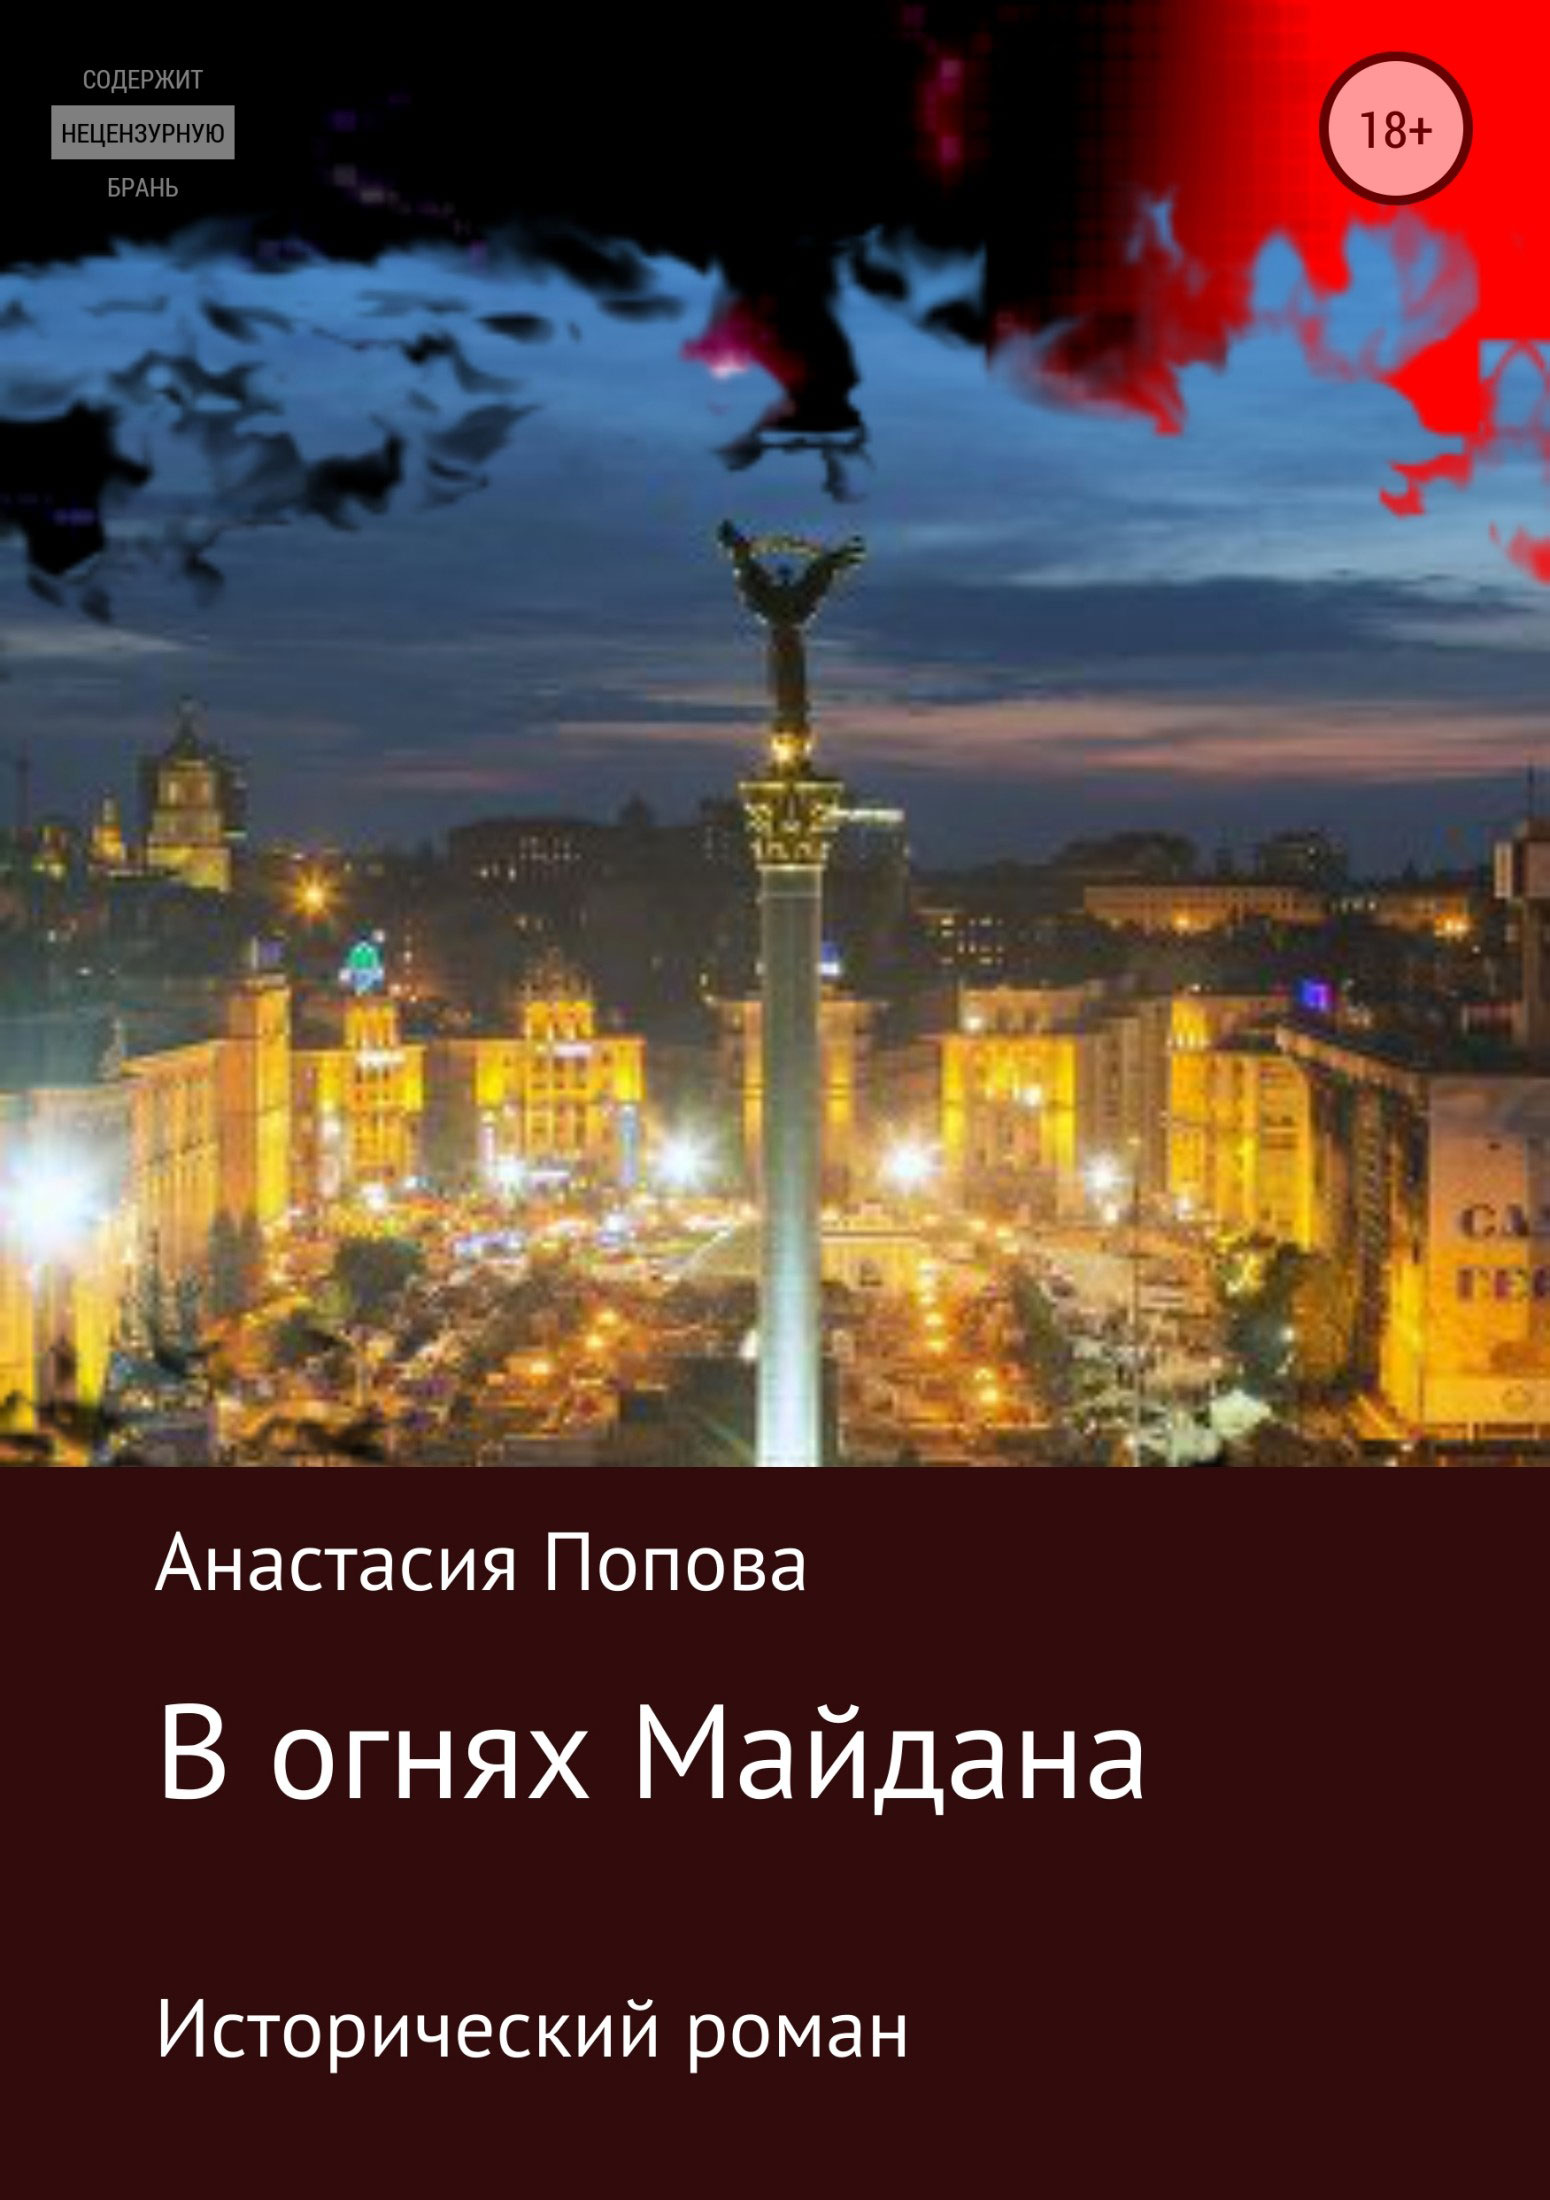 Анастасия Алексеевна Попова В огнях Майдана мария пресняк два майдана